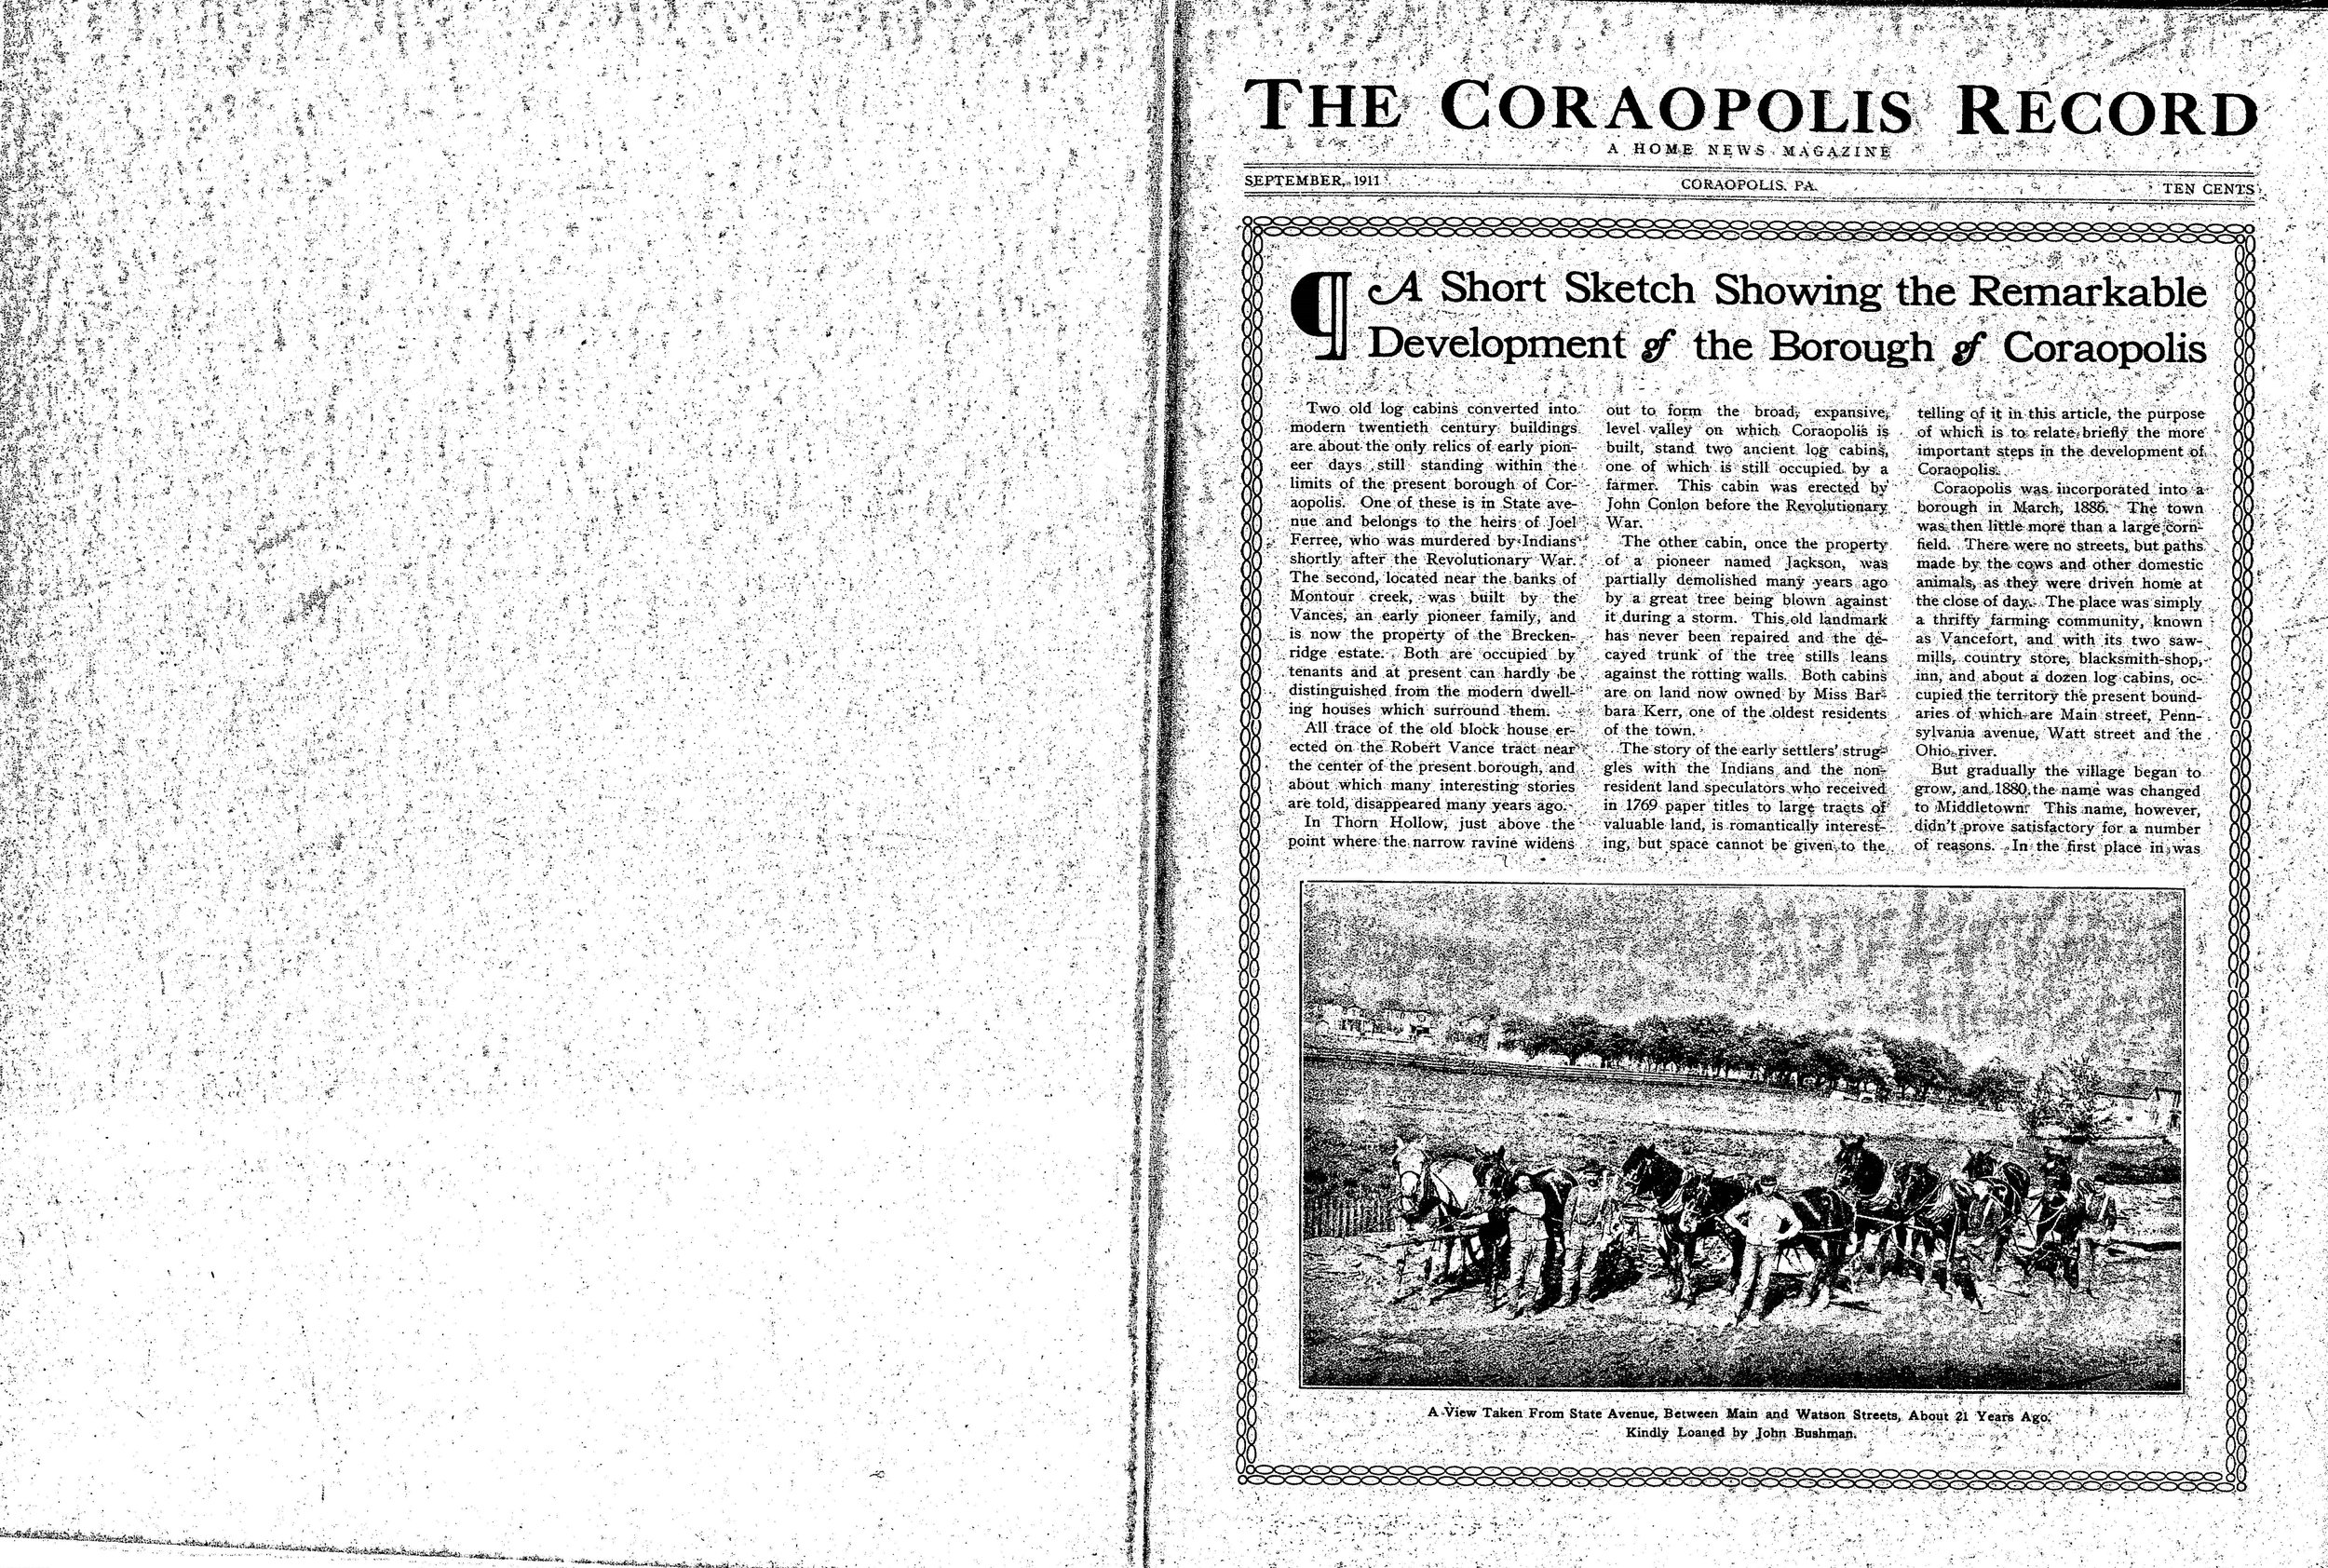 1911-09-15 The Coraopolis Record_Page_03.jpg